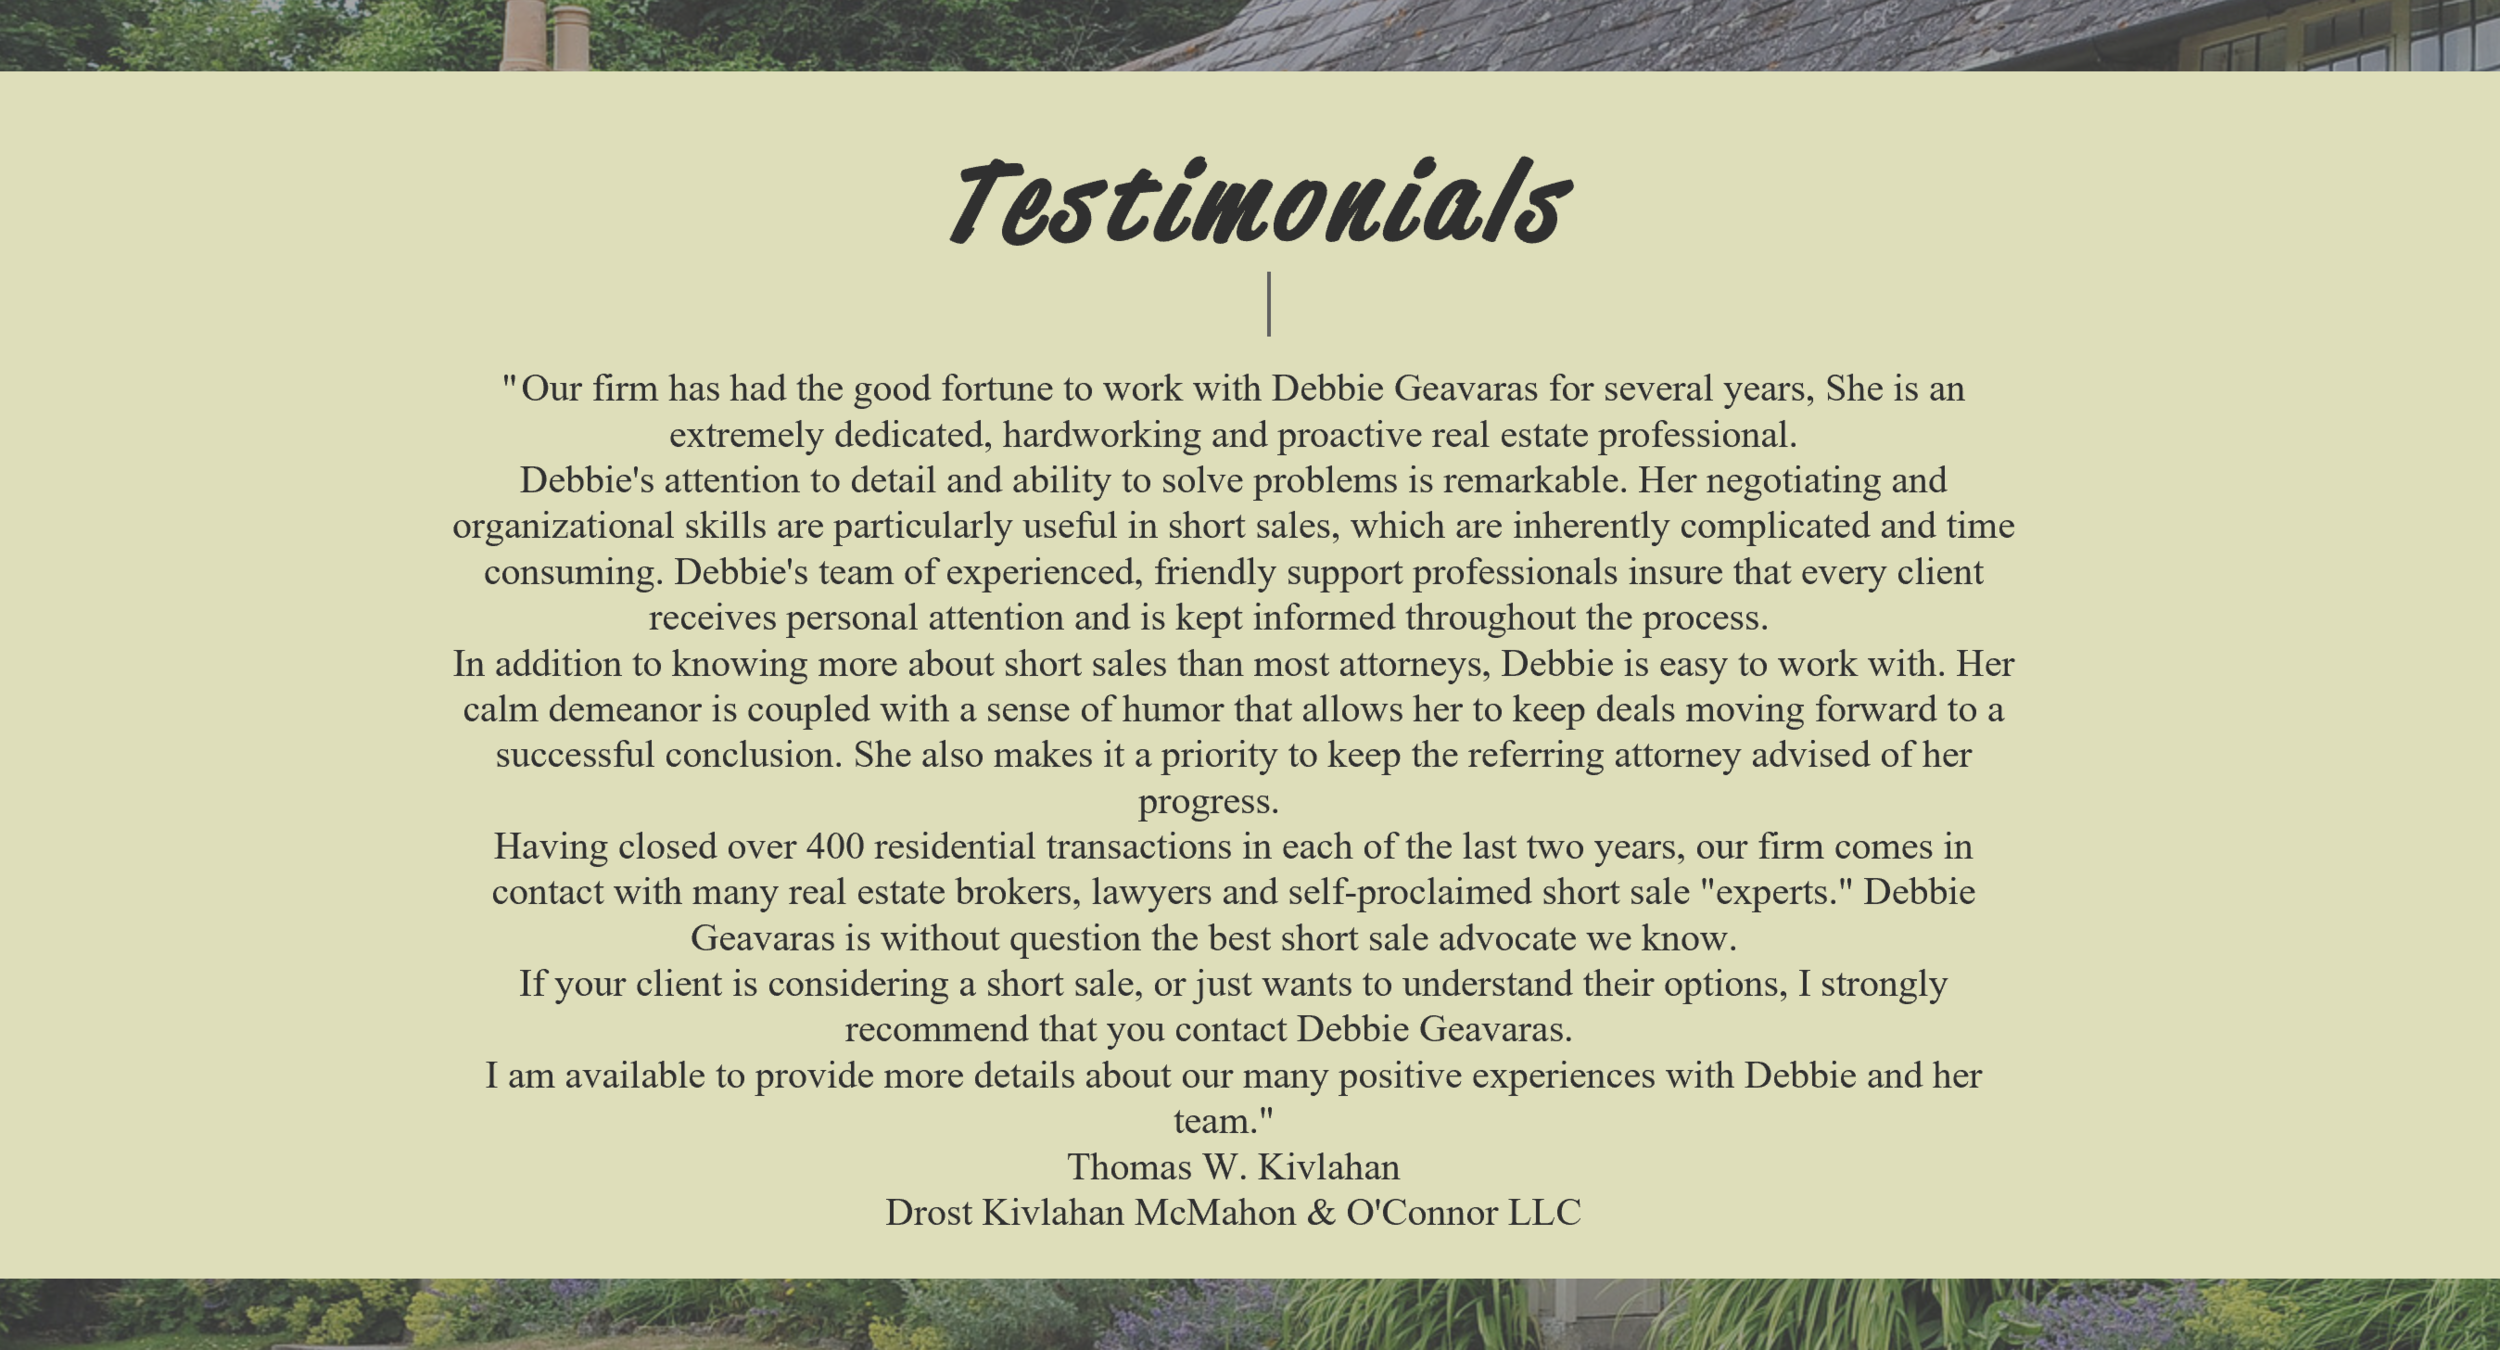 Website design testimonials for real estate agent